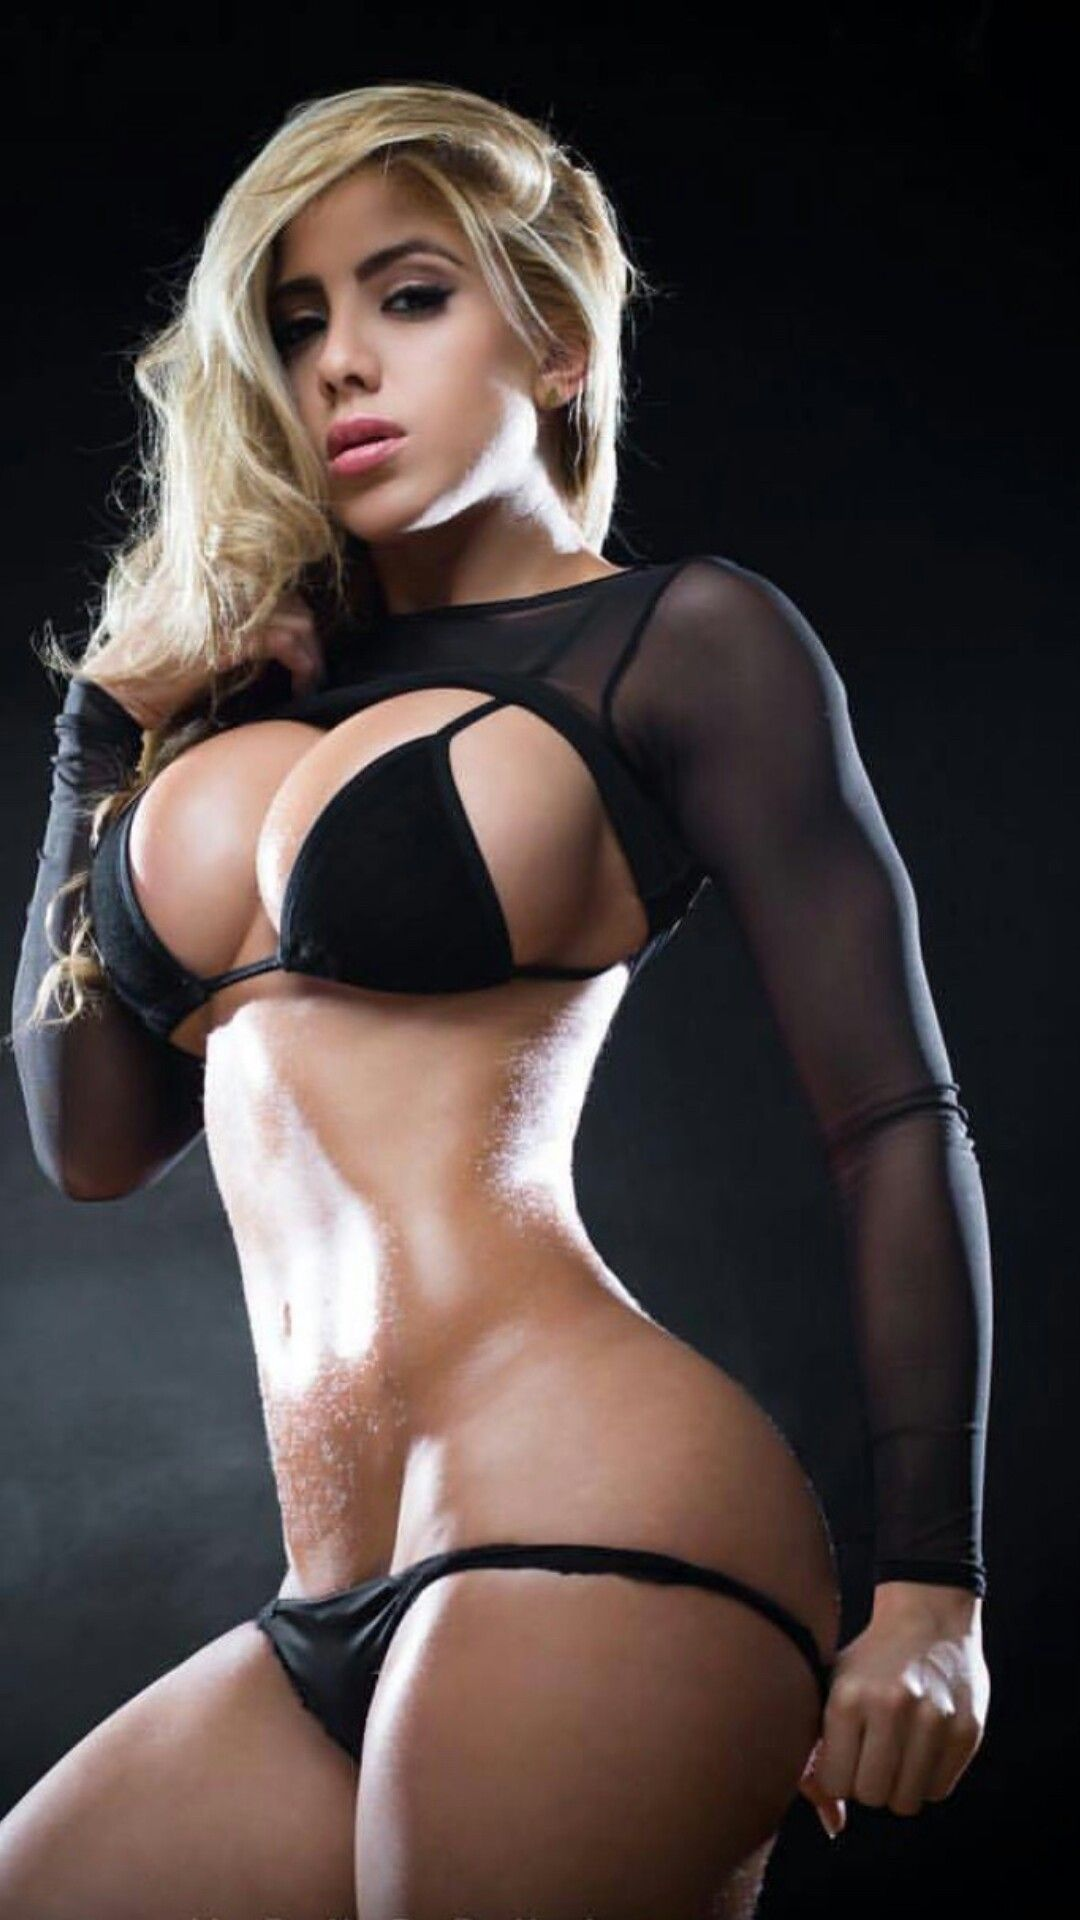 TheFappening Valeria Orsini nude (64 photo), Tits, Fappening, Feet, underwear 2006